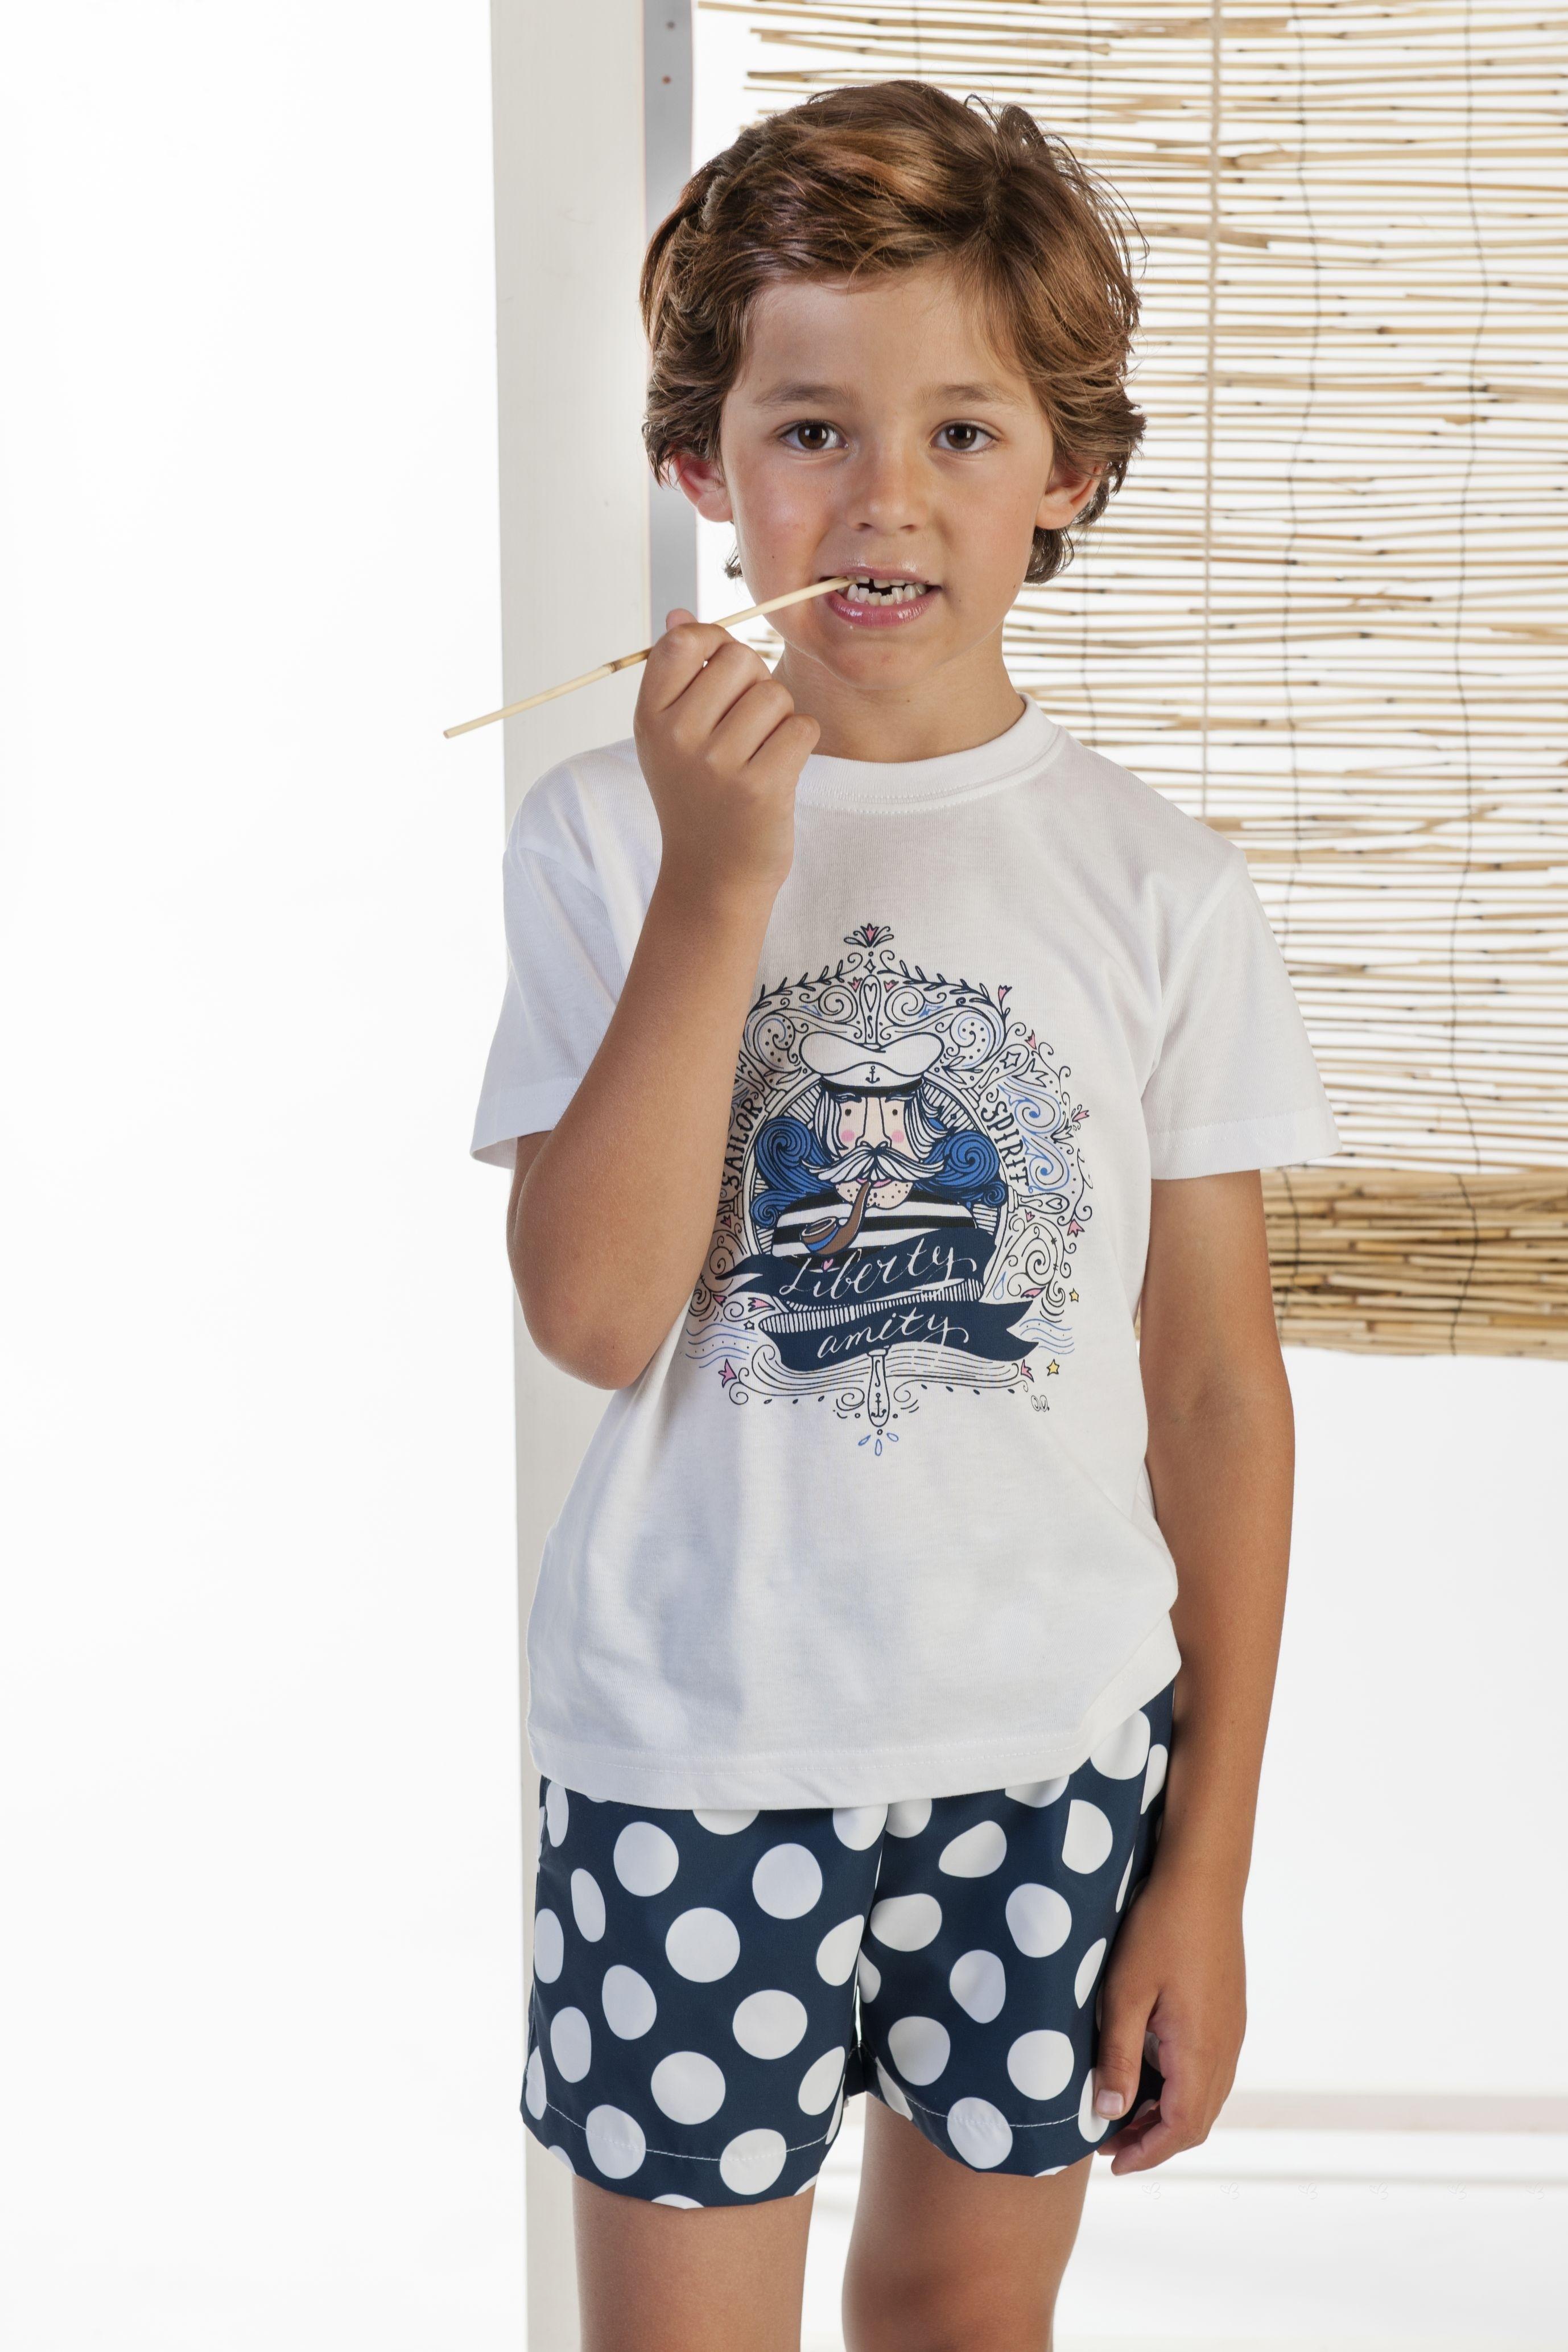 b3255d11c ... José Varón Conjunto Niño Camiseta Capitan Boxer Lunares Marino ...